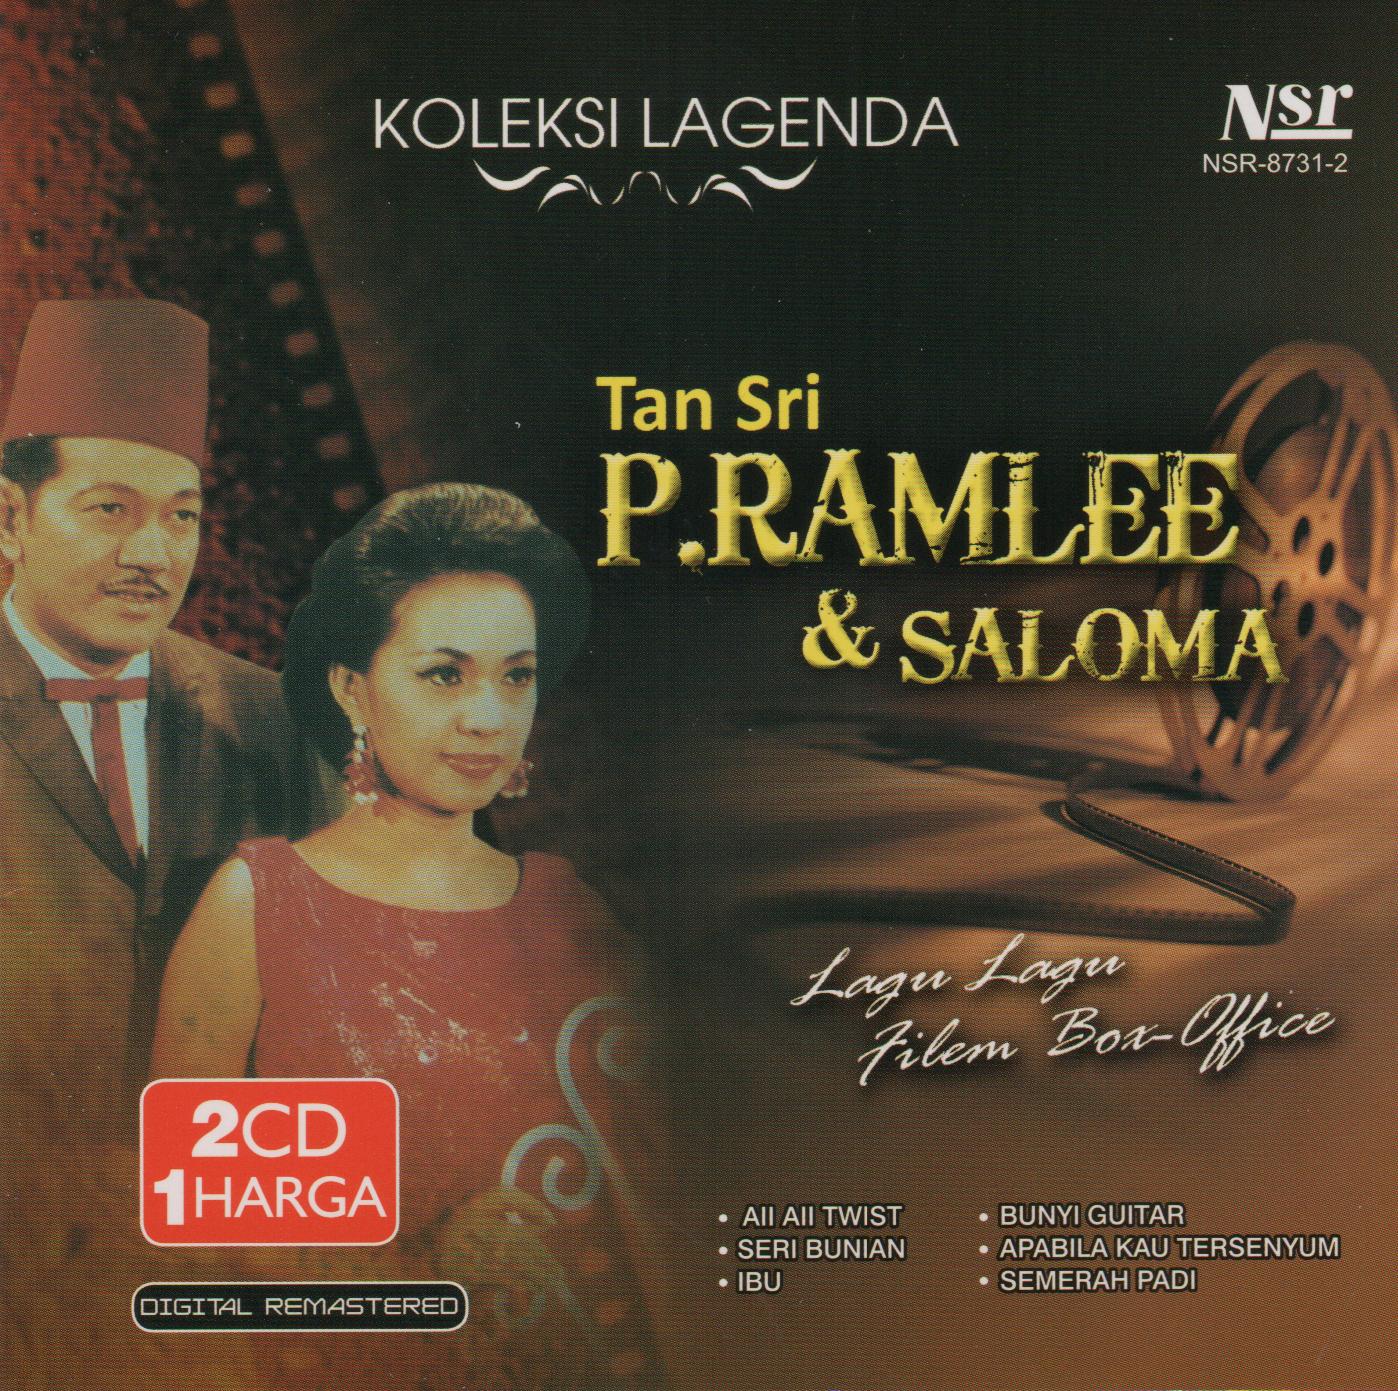 Download Lagu Thank You Next: Bodega Pop: P. Ramlee & Saloma